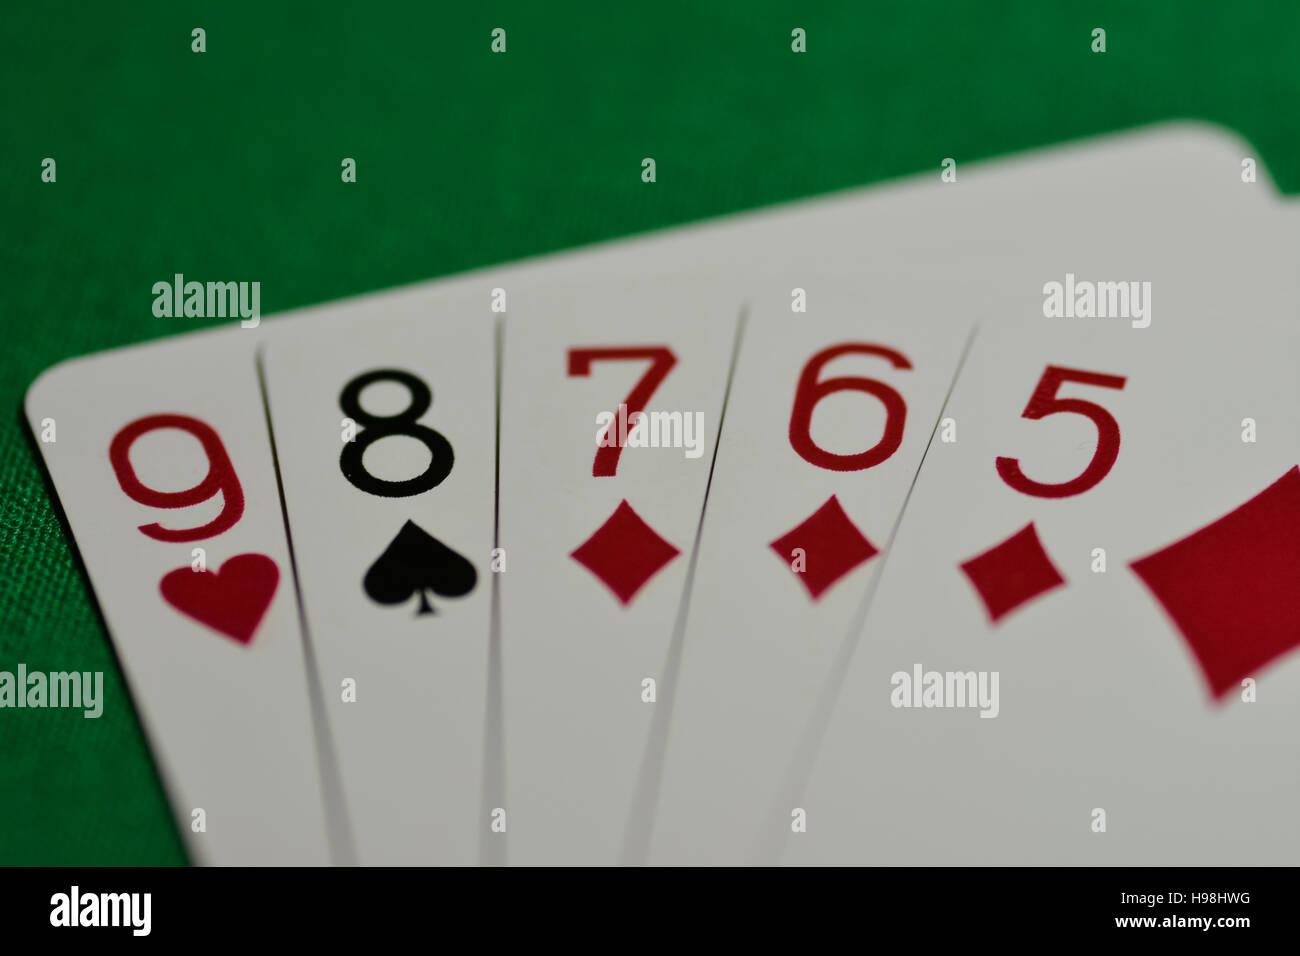 Gambling good william hill bingo.co.uk